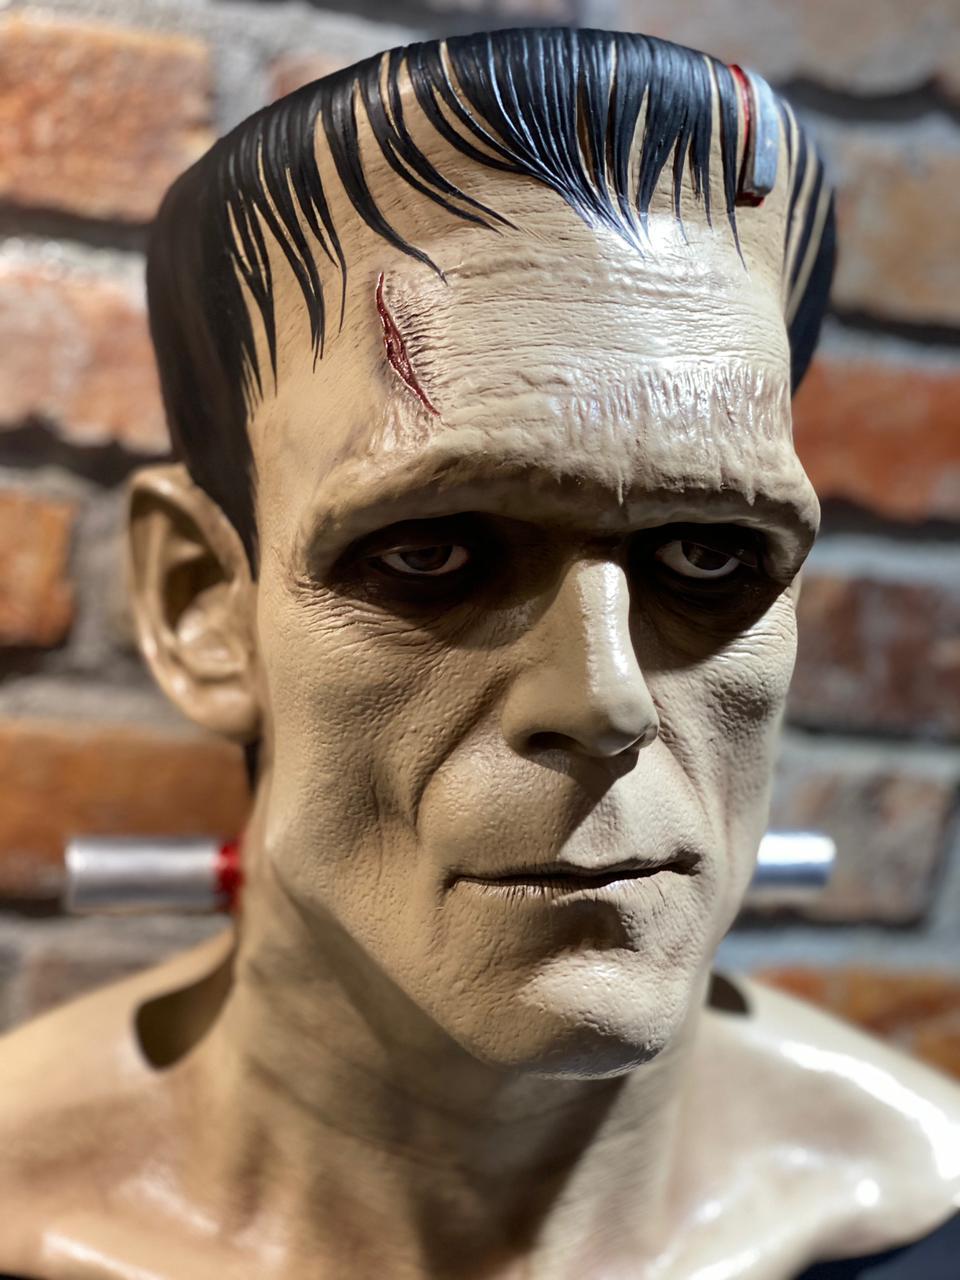 Estátua Busto Monstro de Frankenstein: Frankenstein (Escala 1/1)